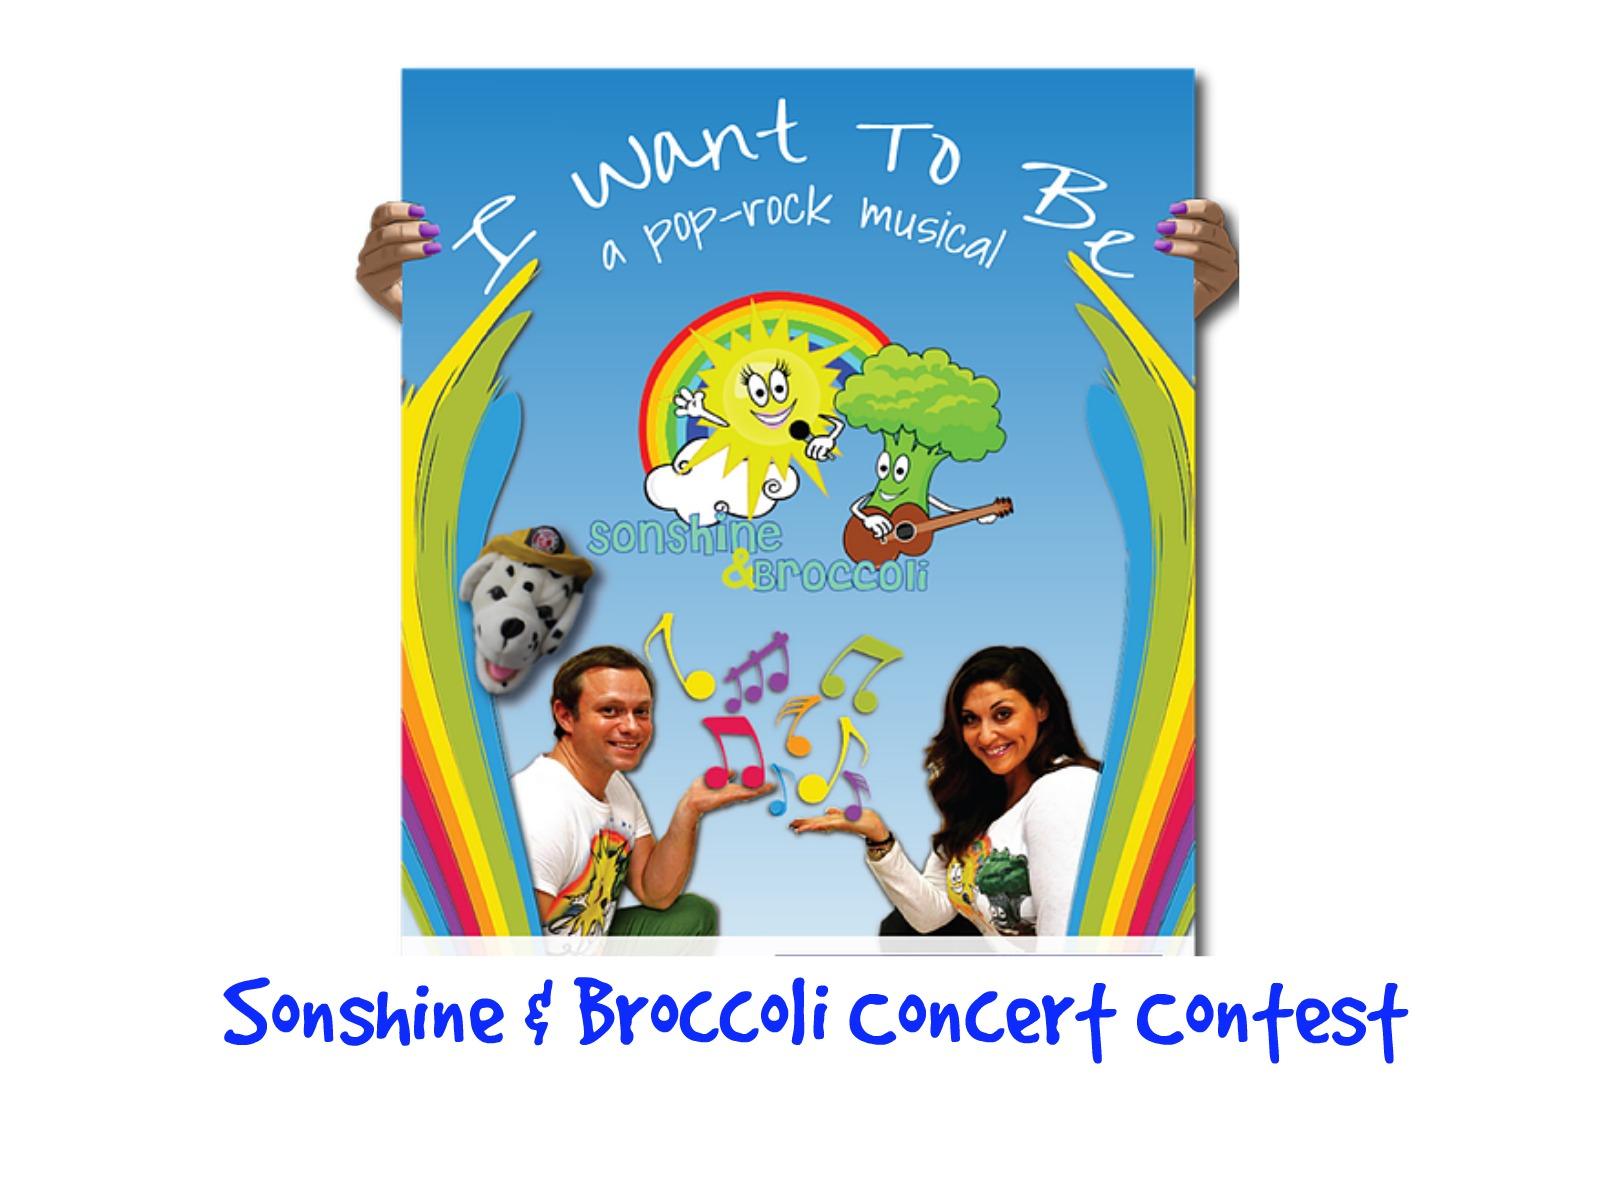 SONSHINE & BROCCOLI CONCERT CONTEST